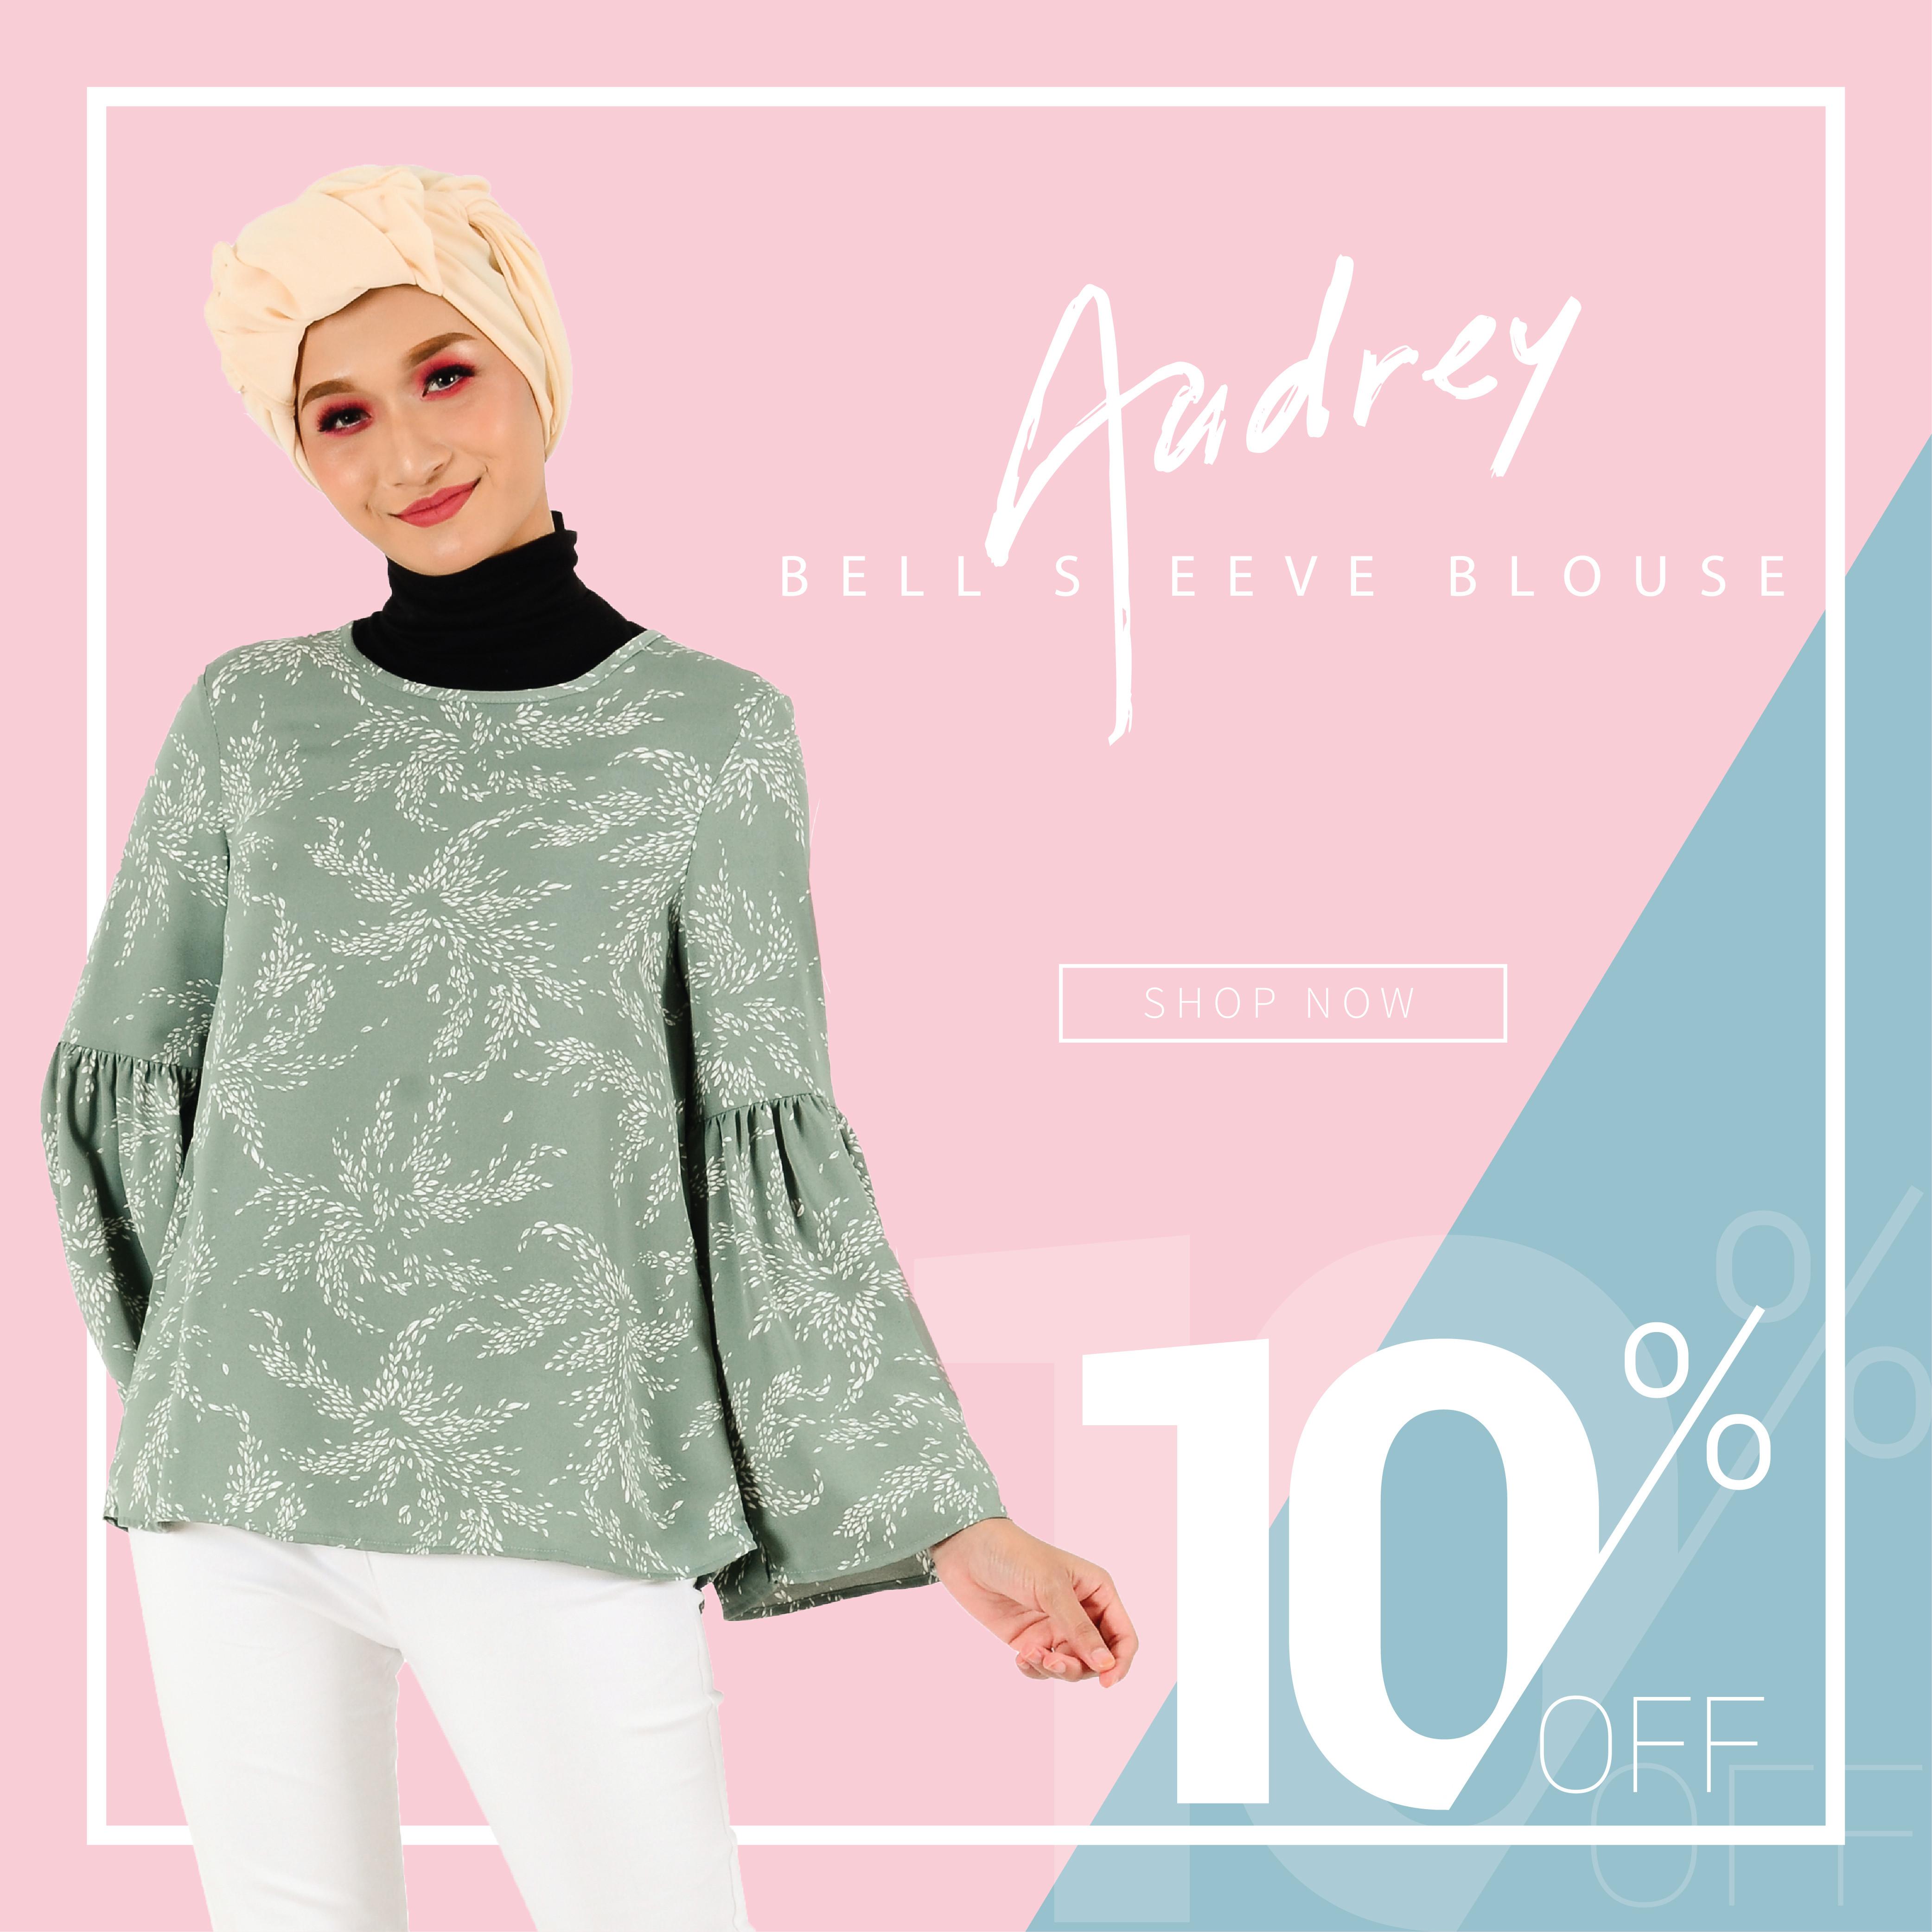 Baju Pengantin Muslimah Simple Tapi Elegan Awesome Mytrend S Muslimah Fashion Blog